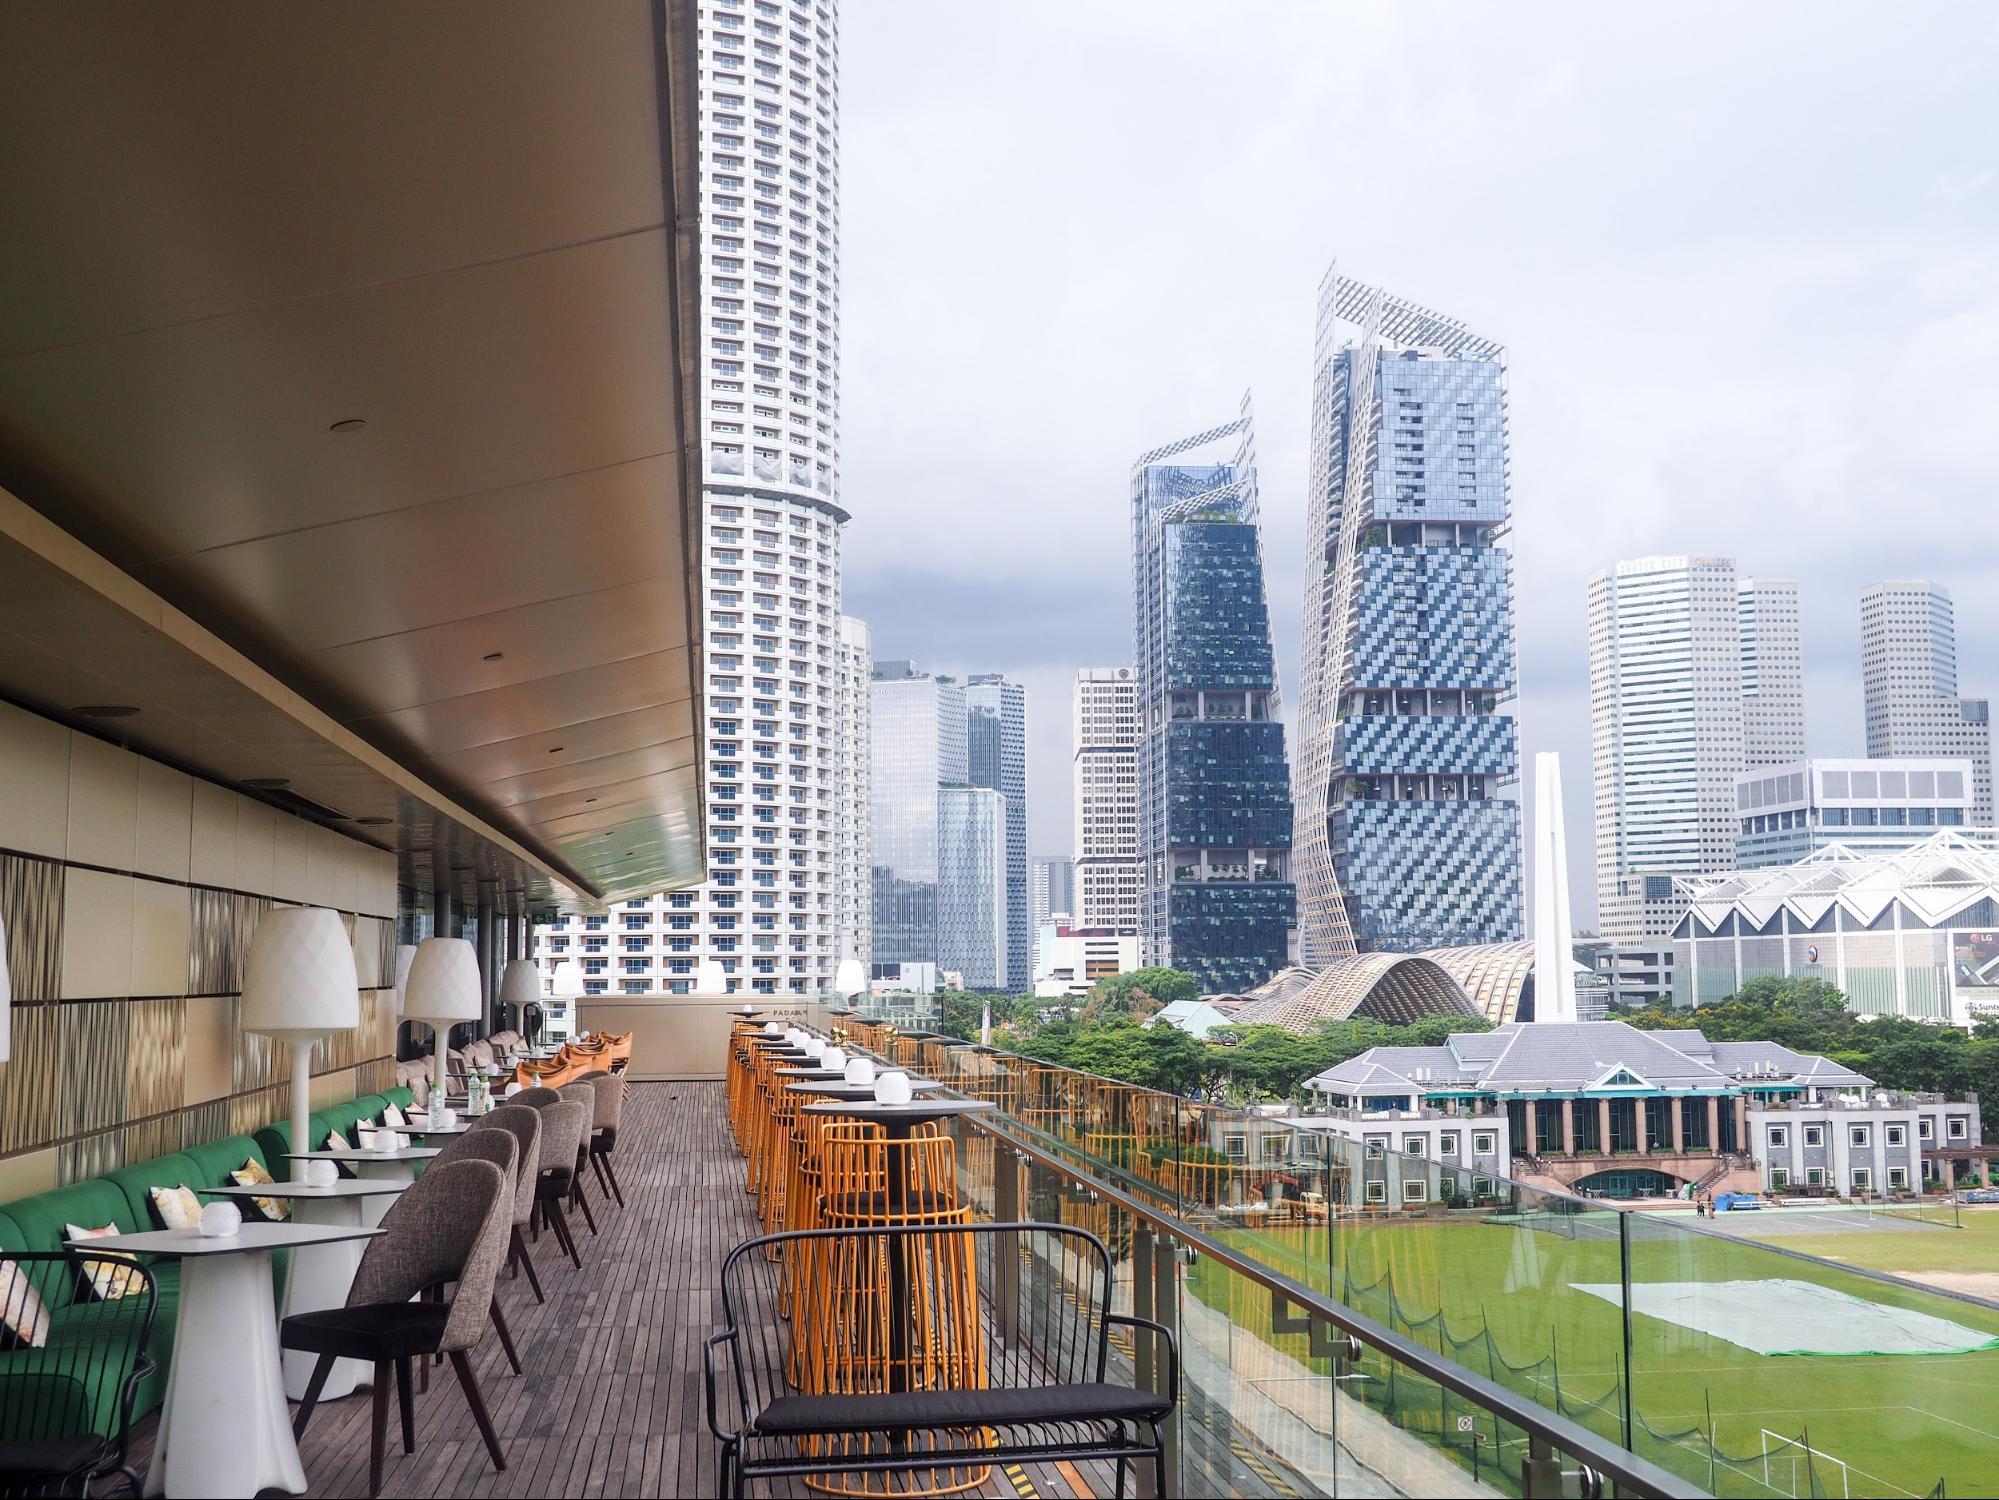 Singapore Marina Bay National Gallery